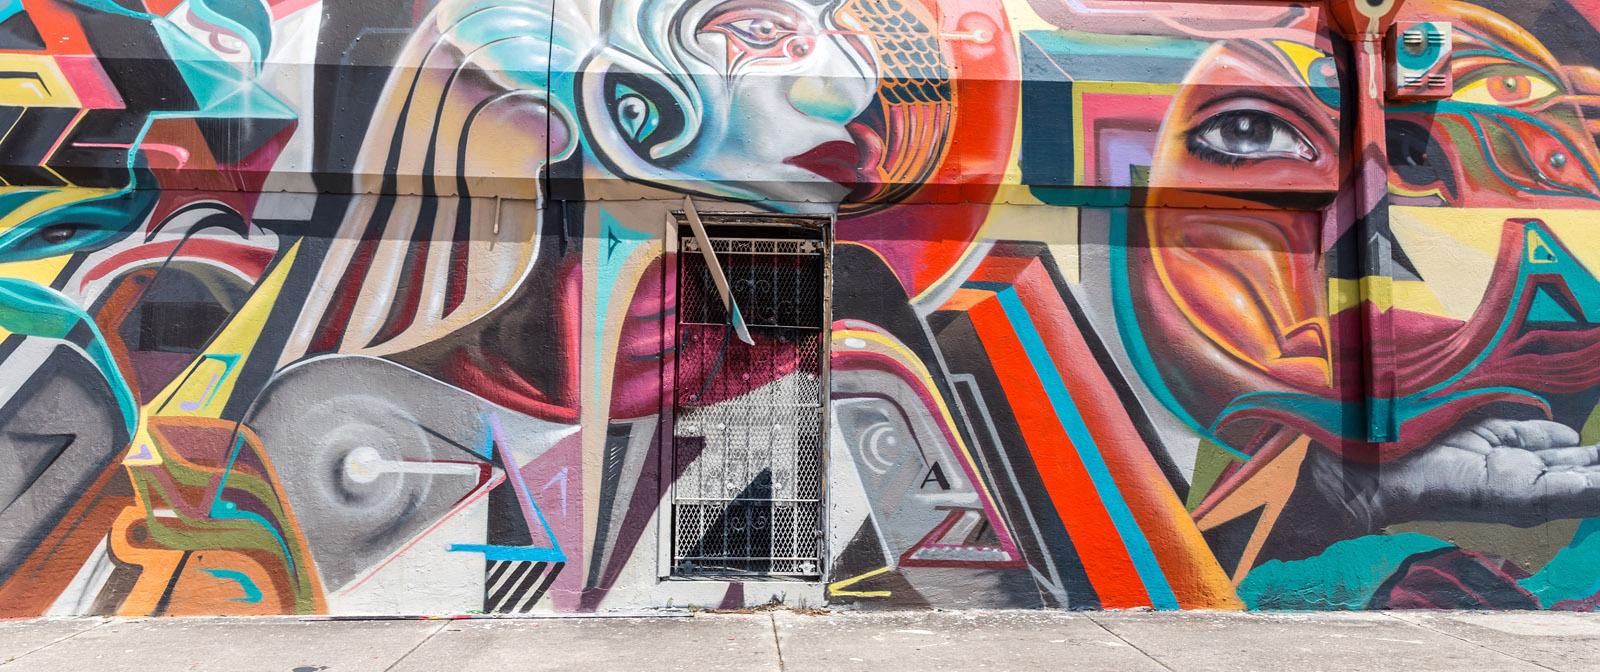 Spirit-&-Flesh-Magazine_The-Power-of-Graffiti_article_by_Julia-Wood_04